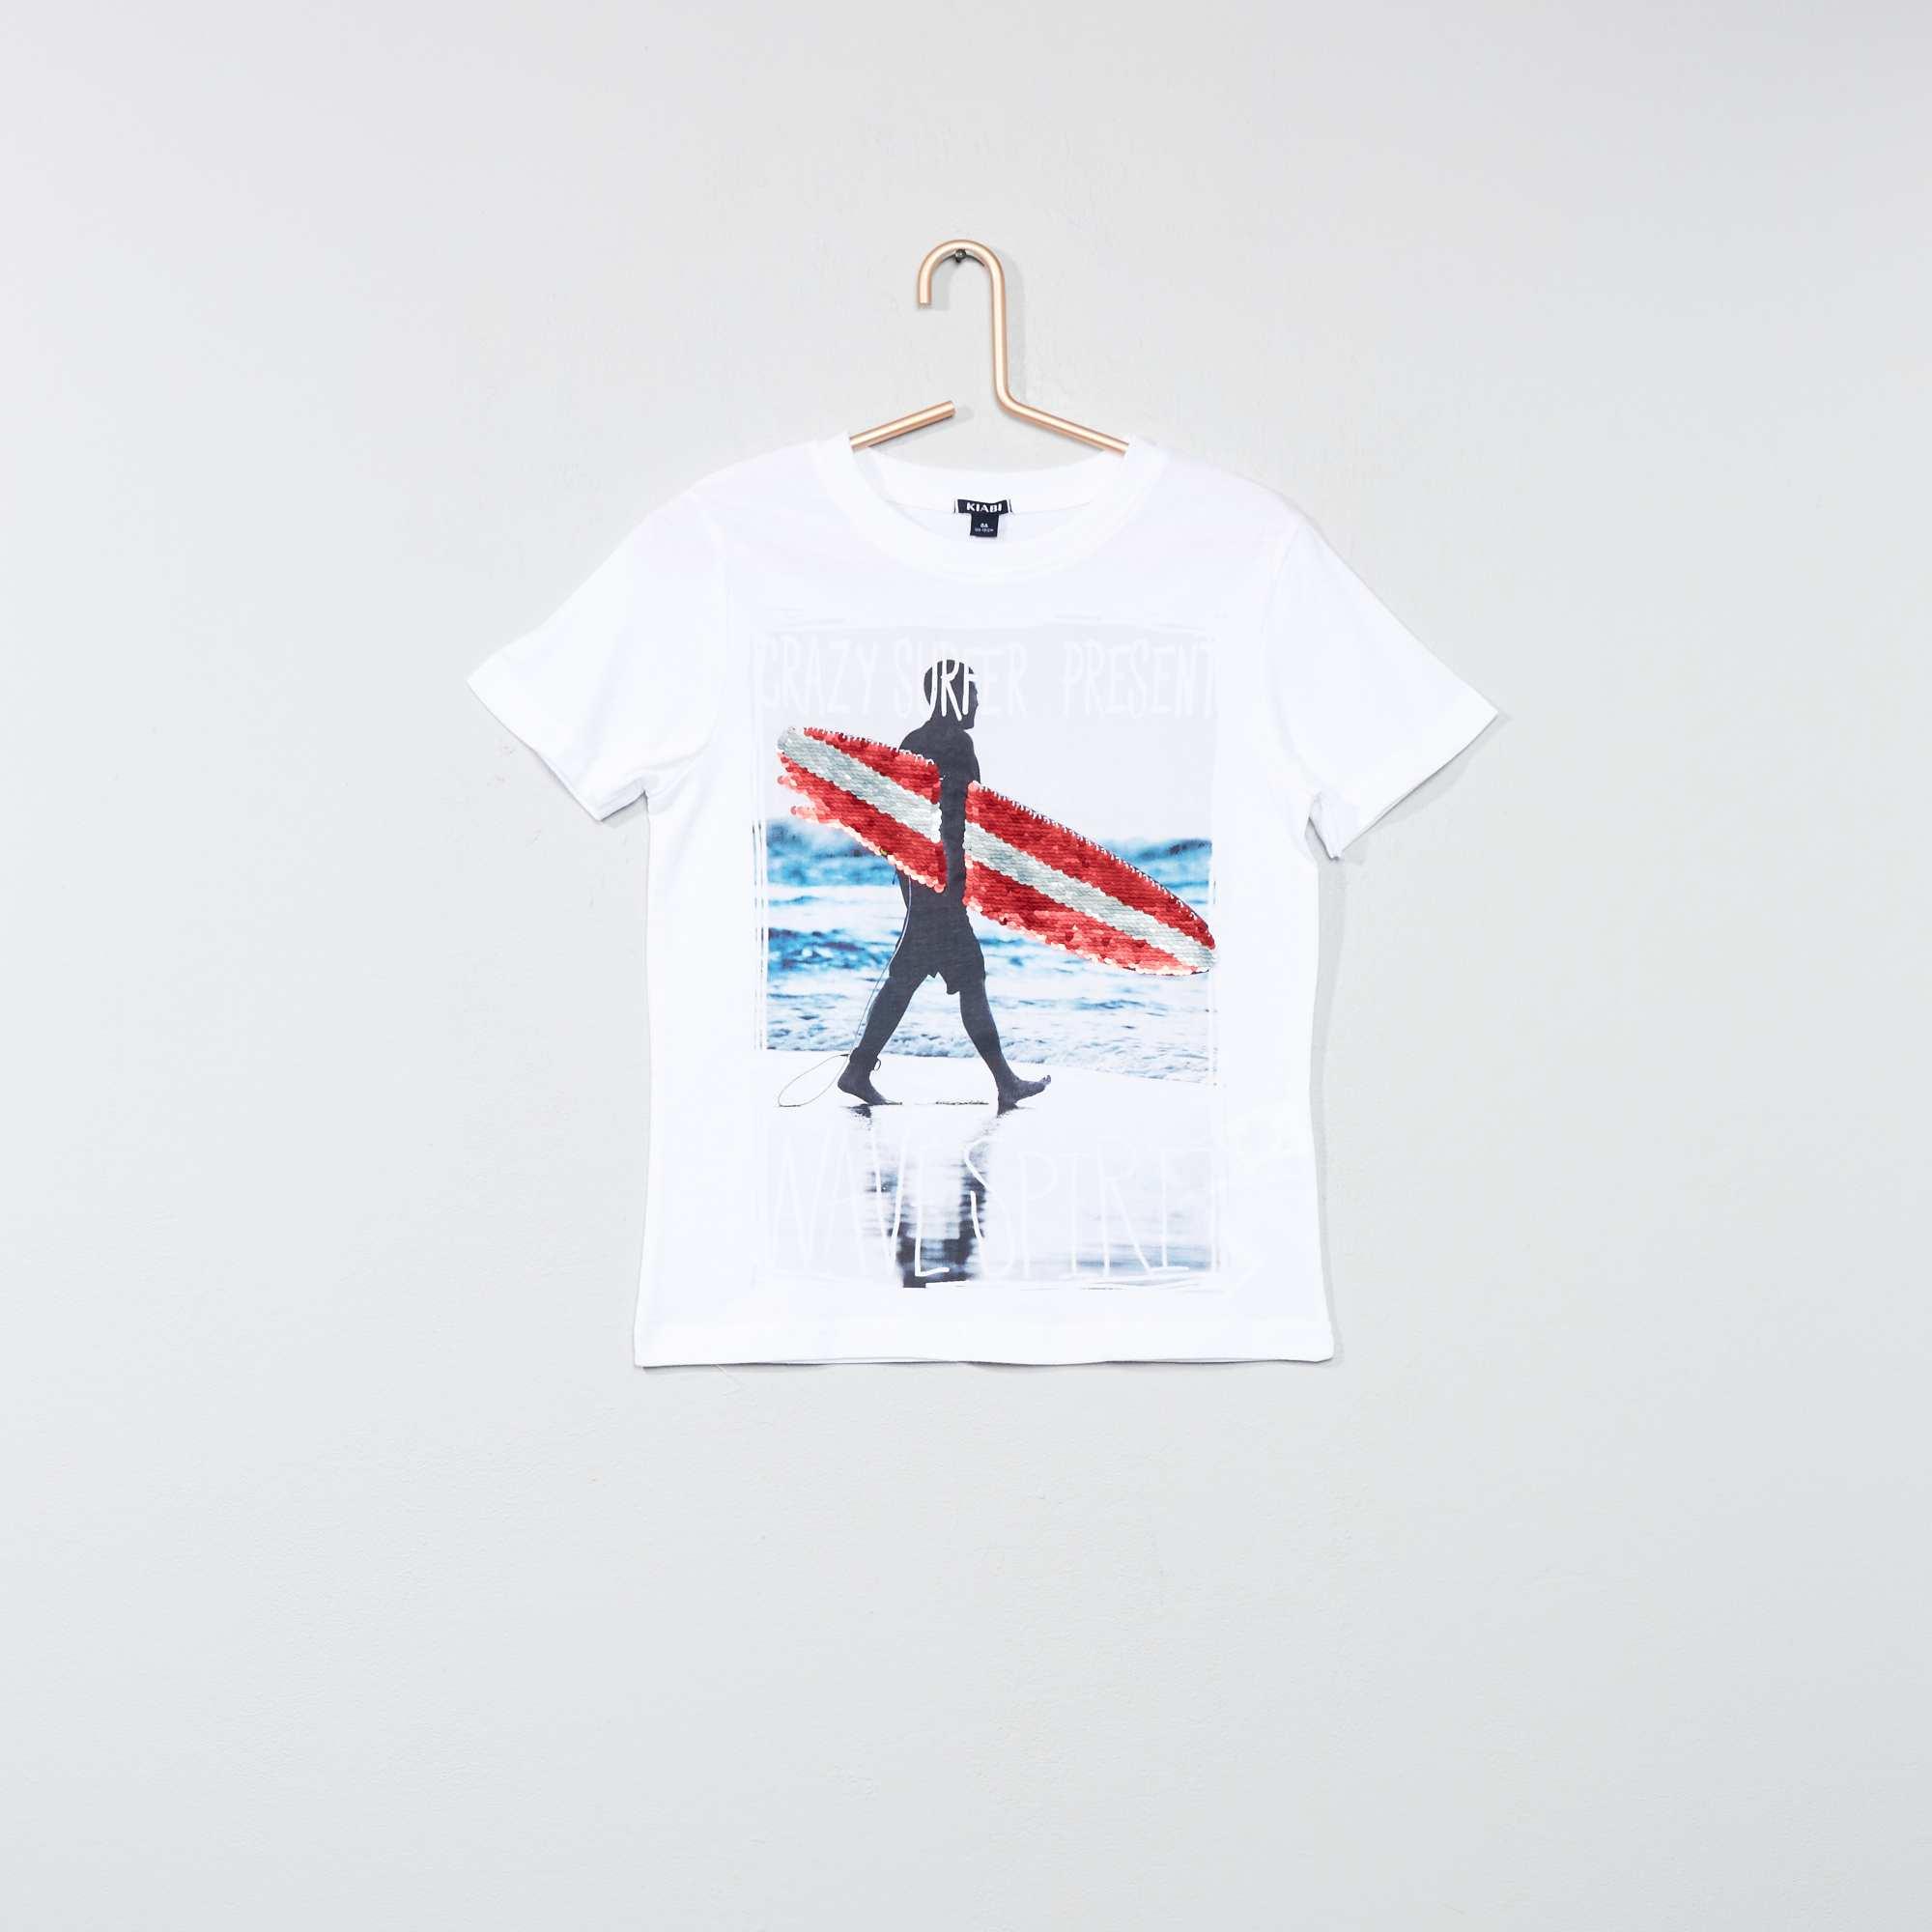 7c35bd8108fc6 Tee-shirt pur coton à sequins réversible Garçon - blanc - Kiabi - 8